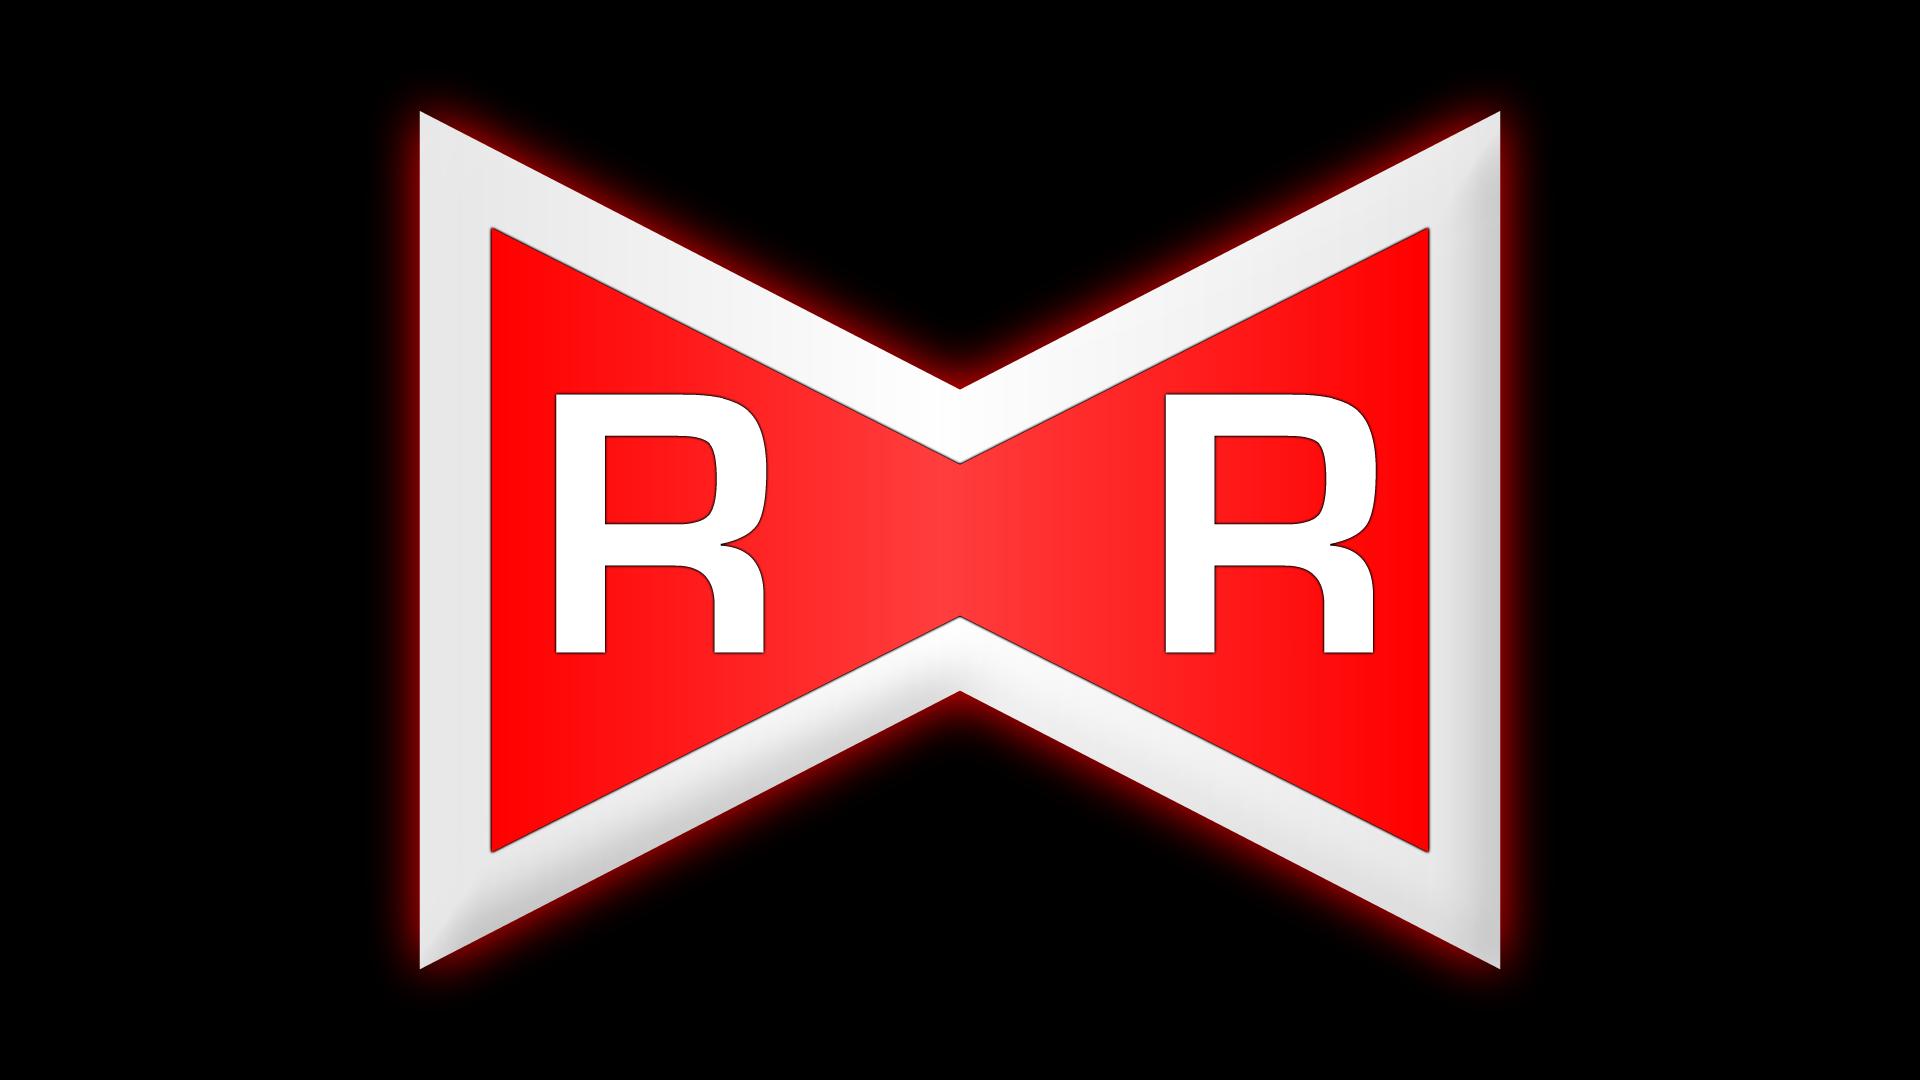 Red Ribbon Symbol